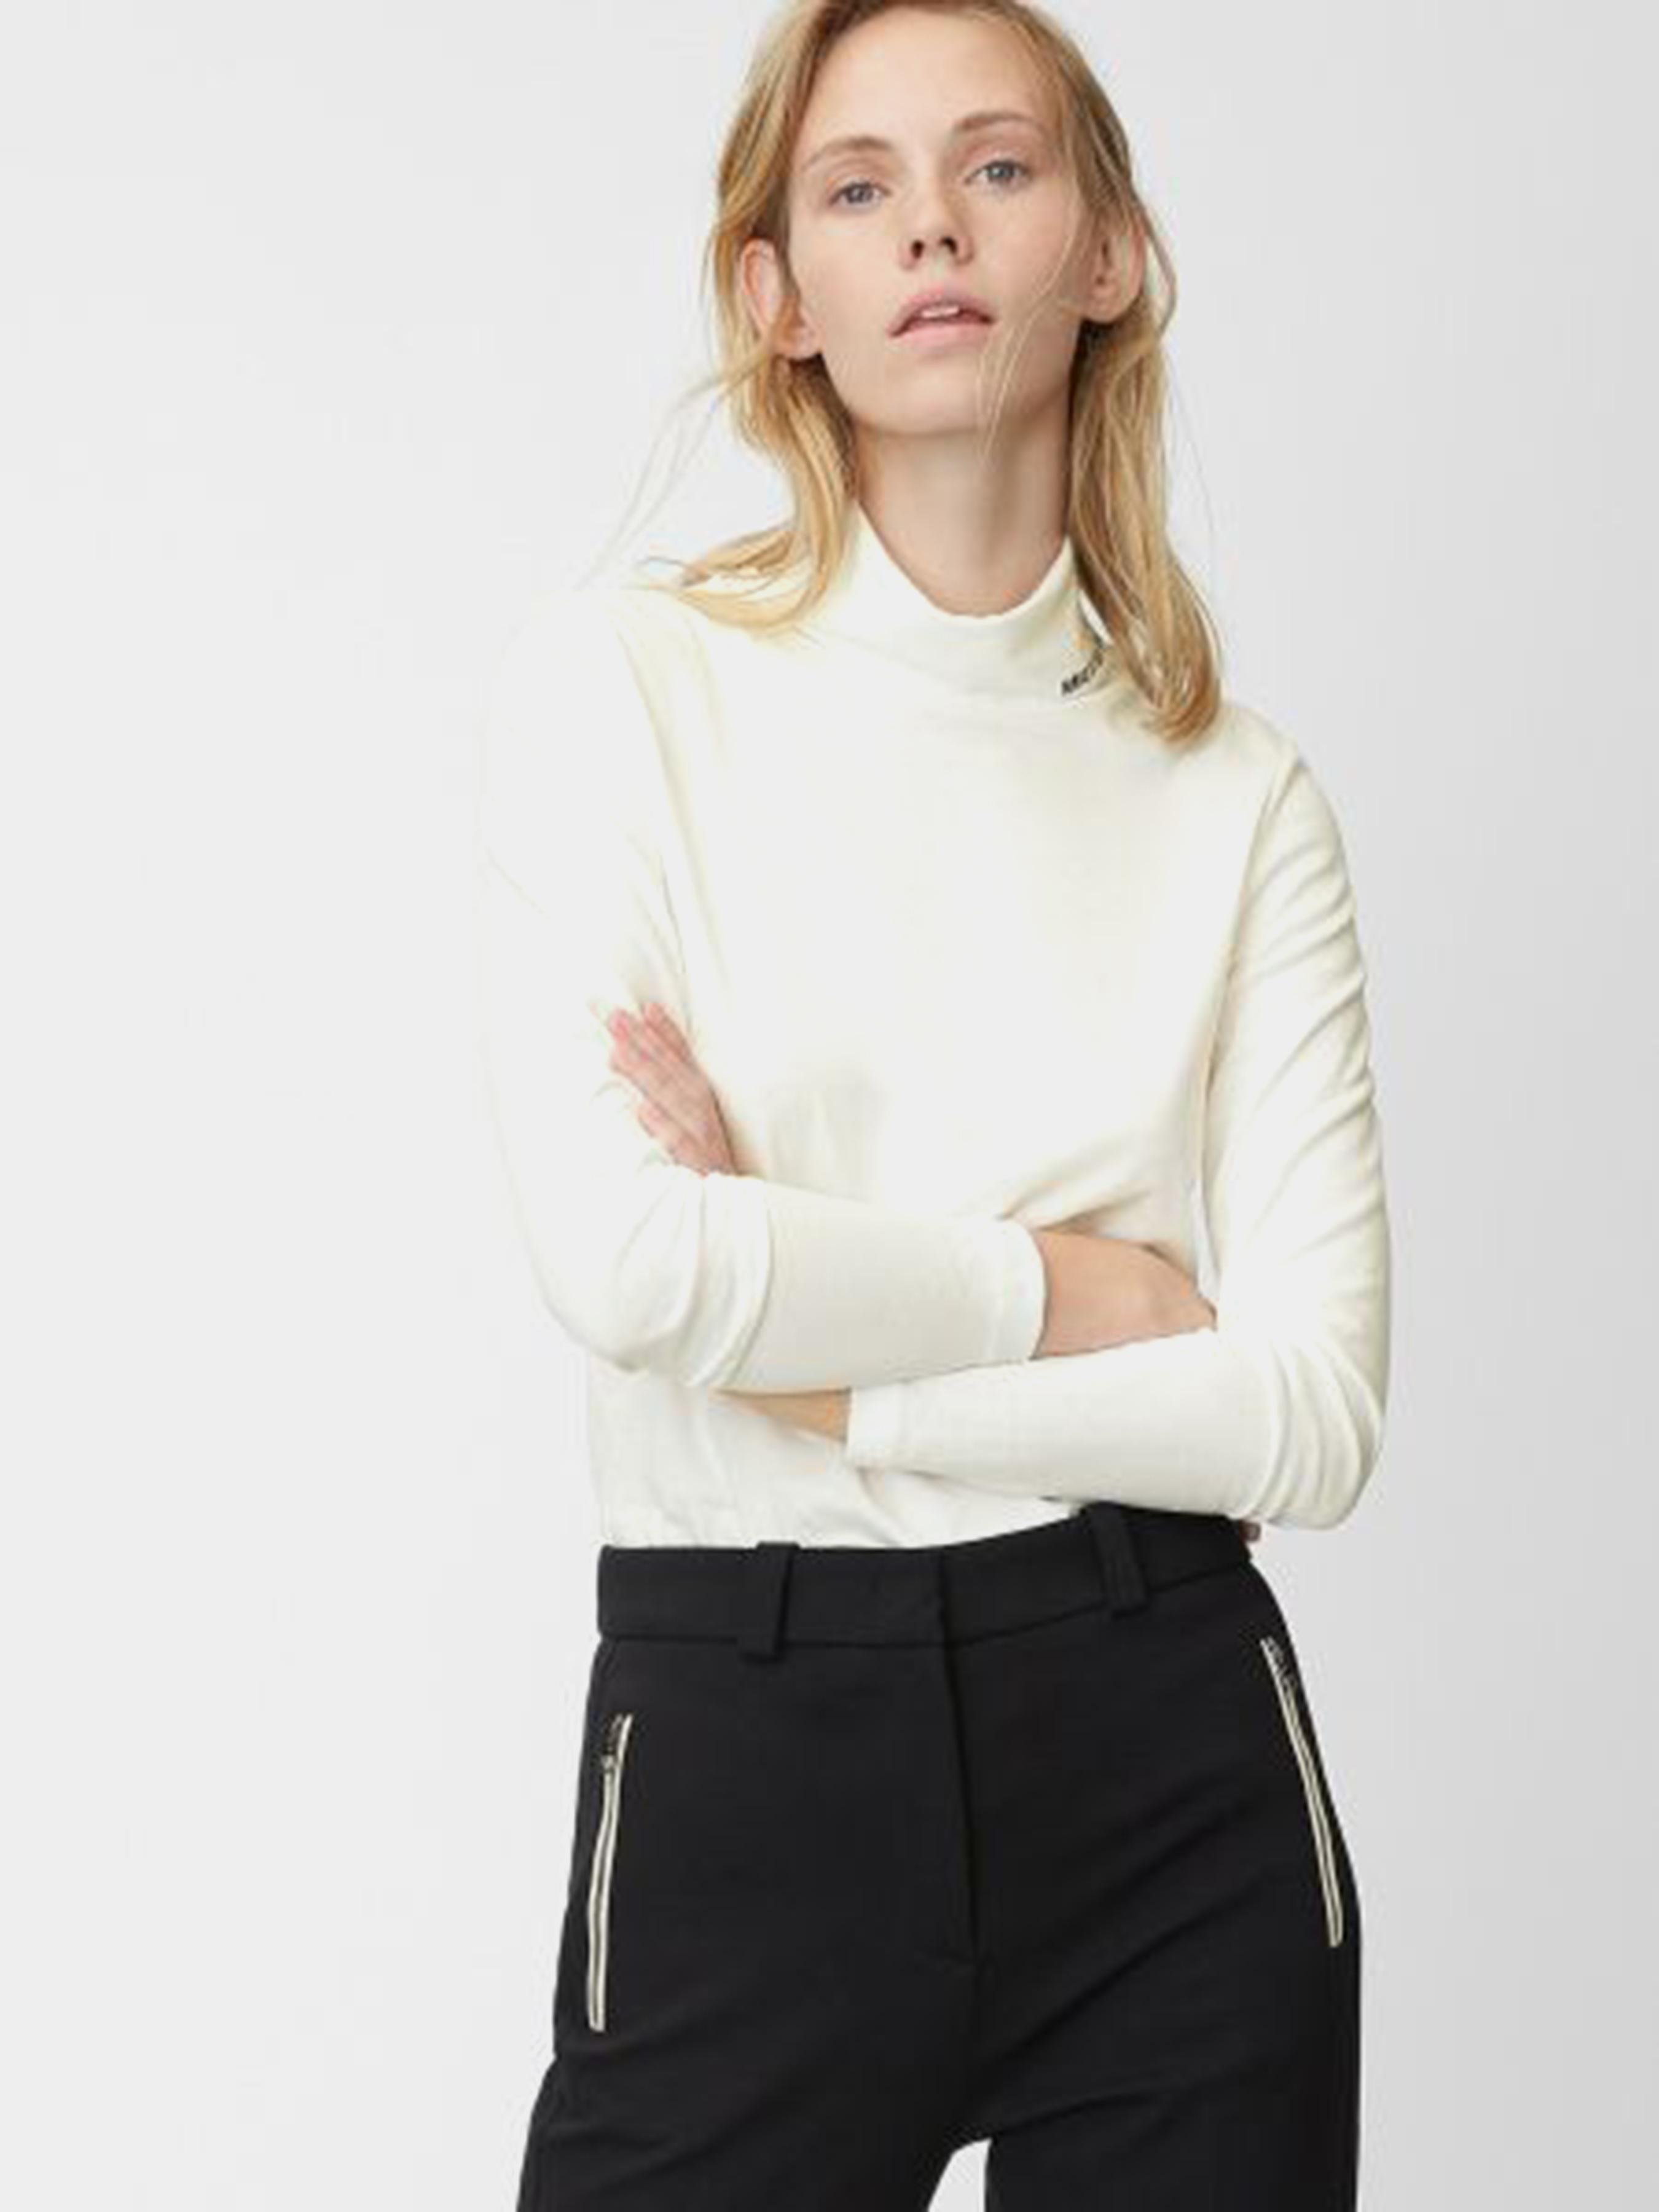 Кофты и свитера женские MARC O'POLO модель PF3878 характеристики, 2017